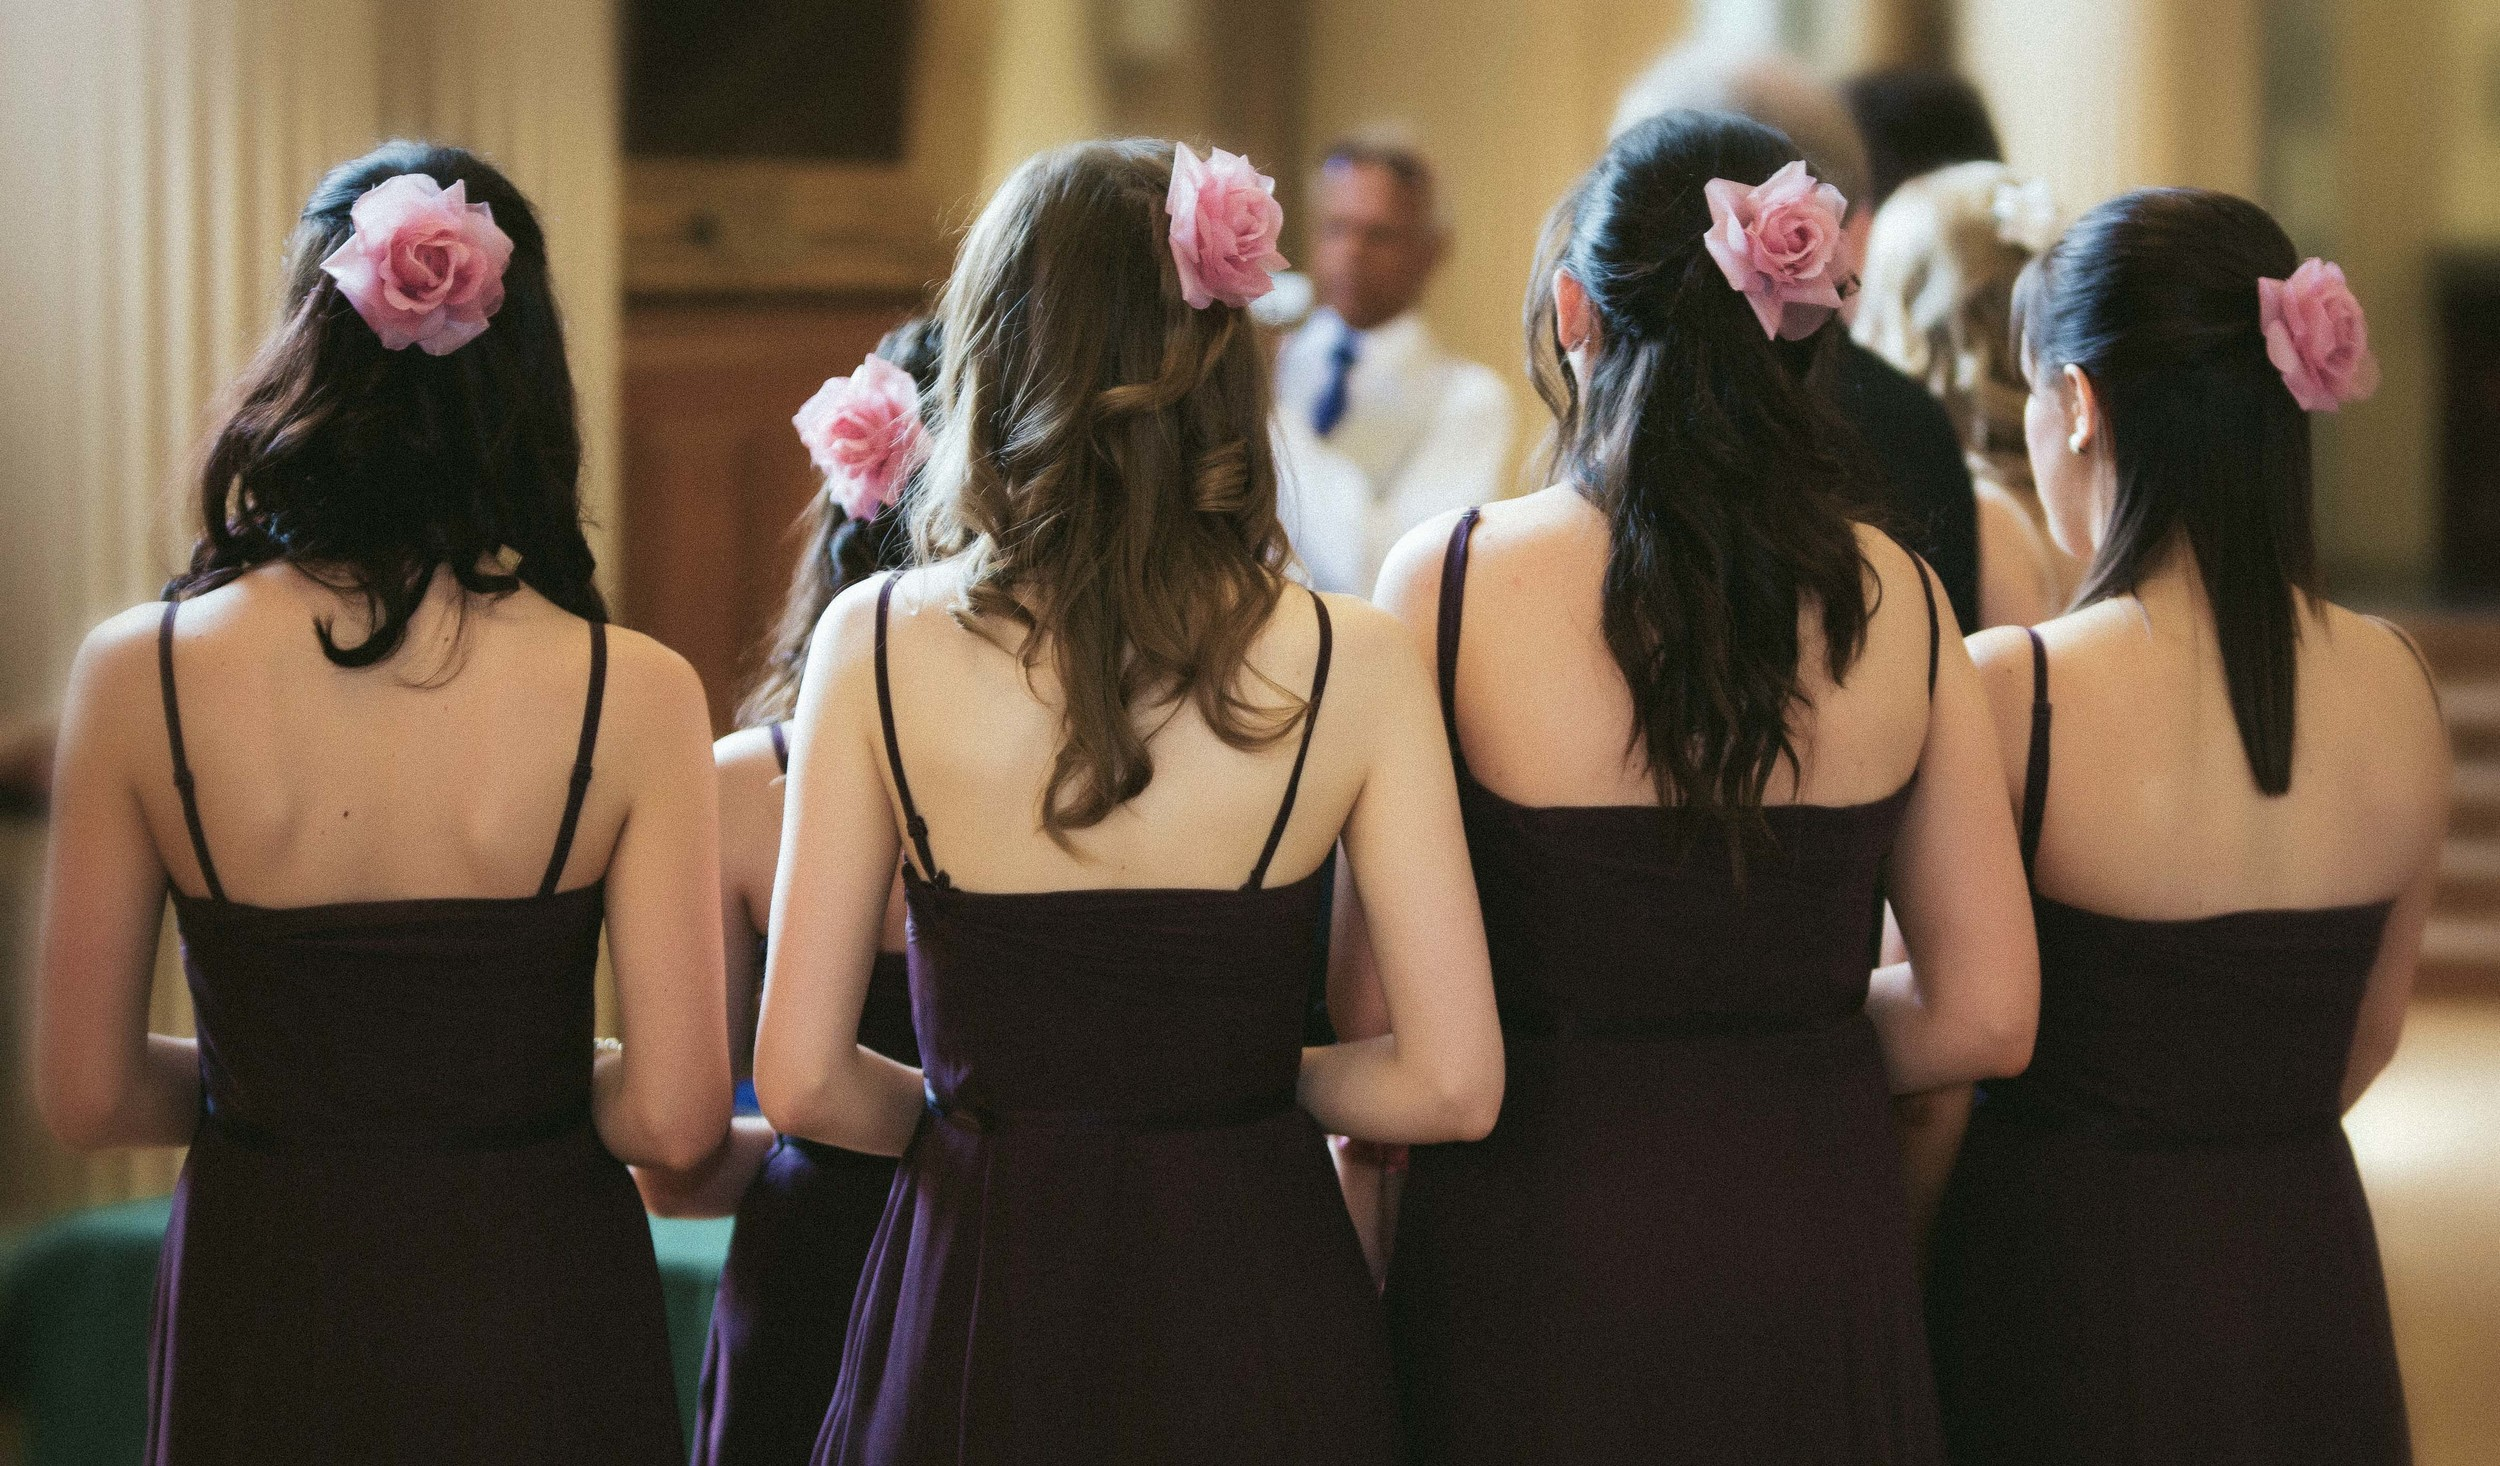 essex-bridesmaids-2-london-uk-destination-wedding-photography-Adam-Rowley